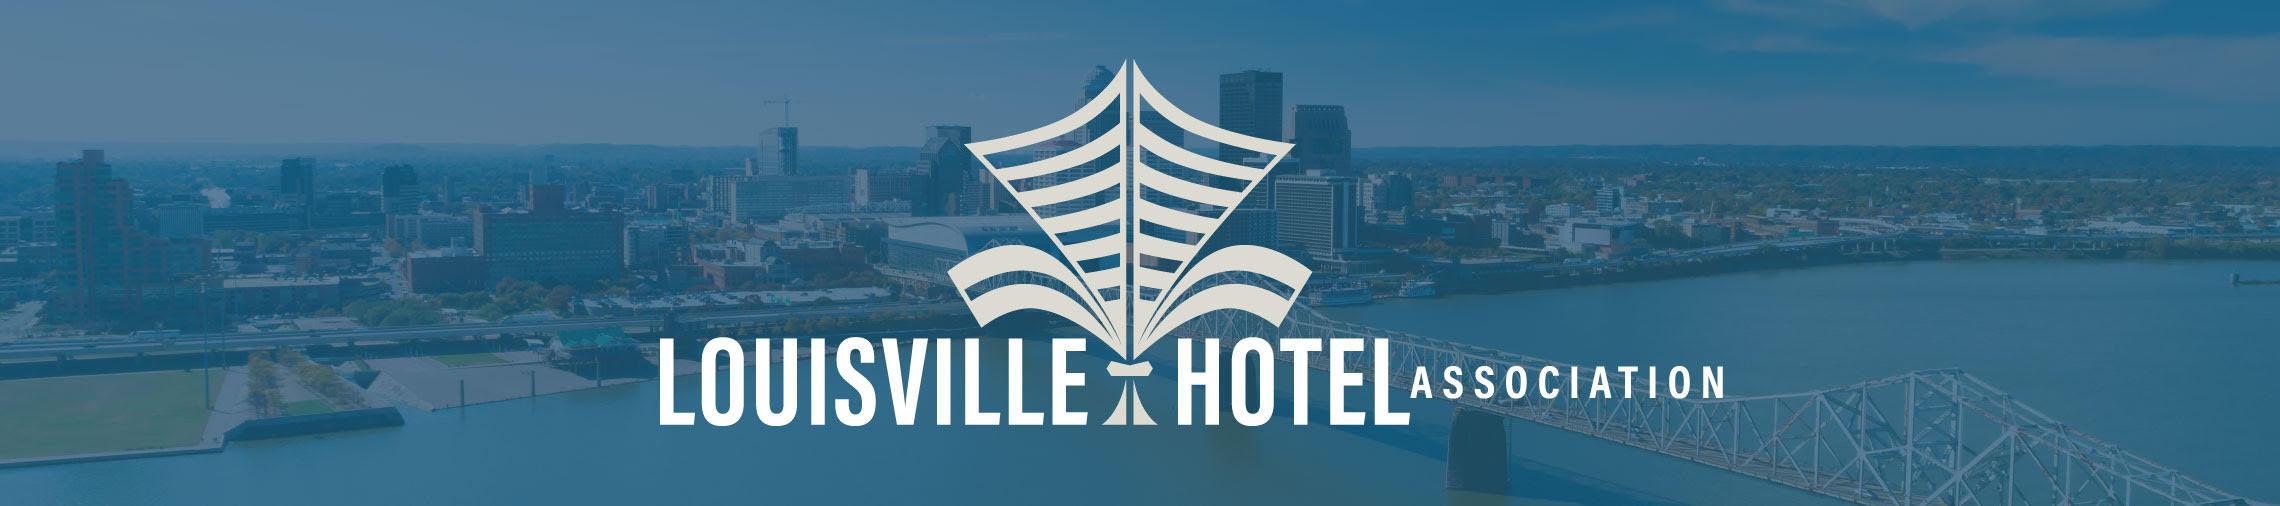 Louisville Hotel Association